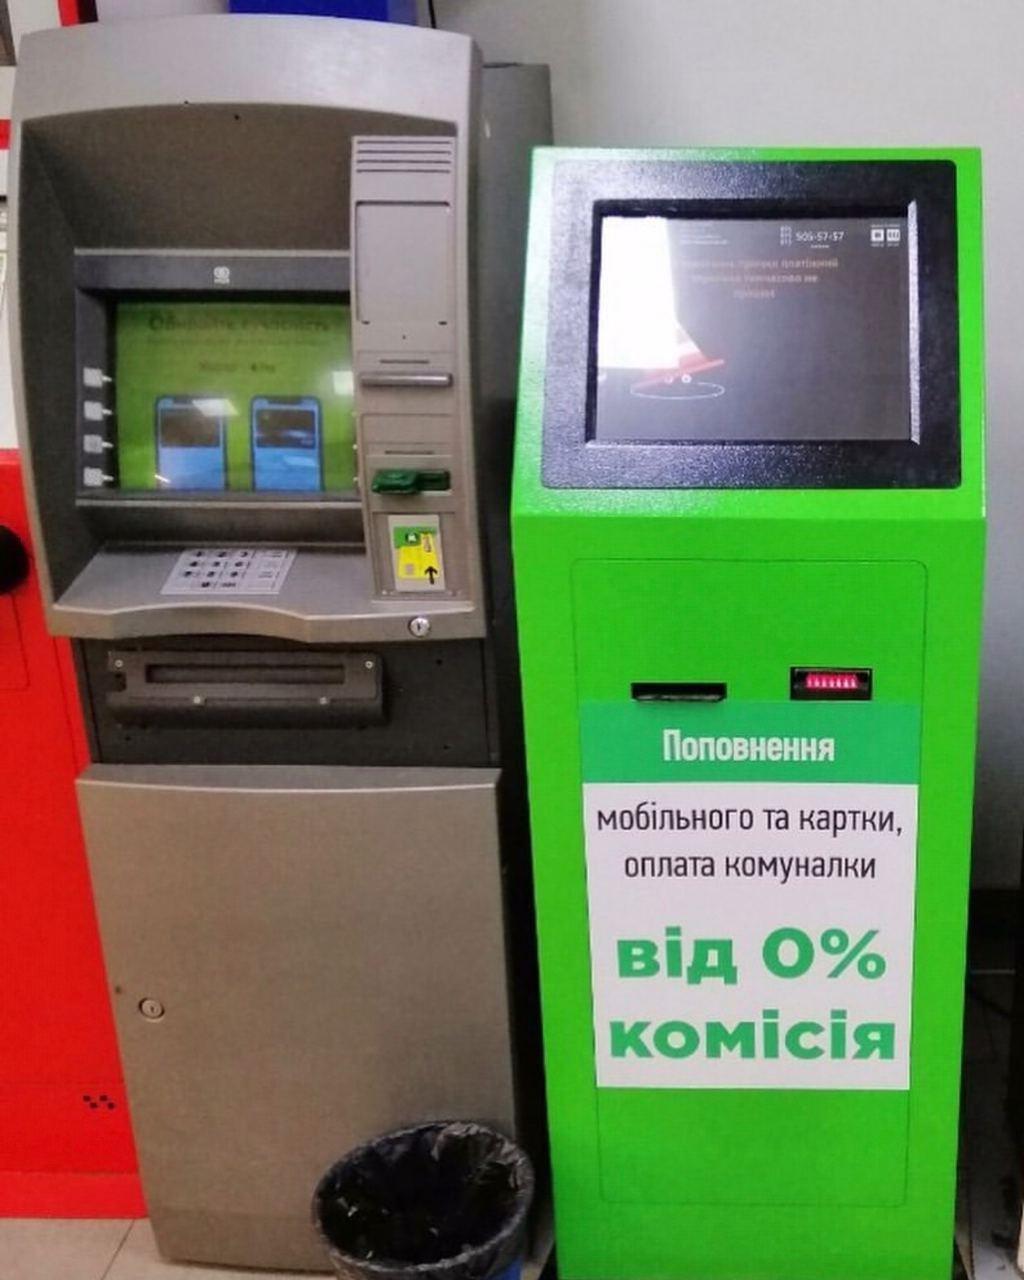 Moneybox - Мой отзыв о moneybox.net.ua